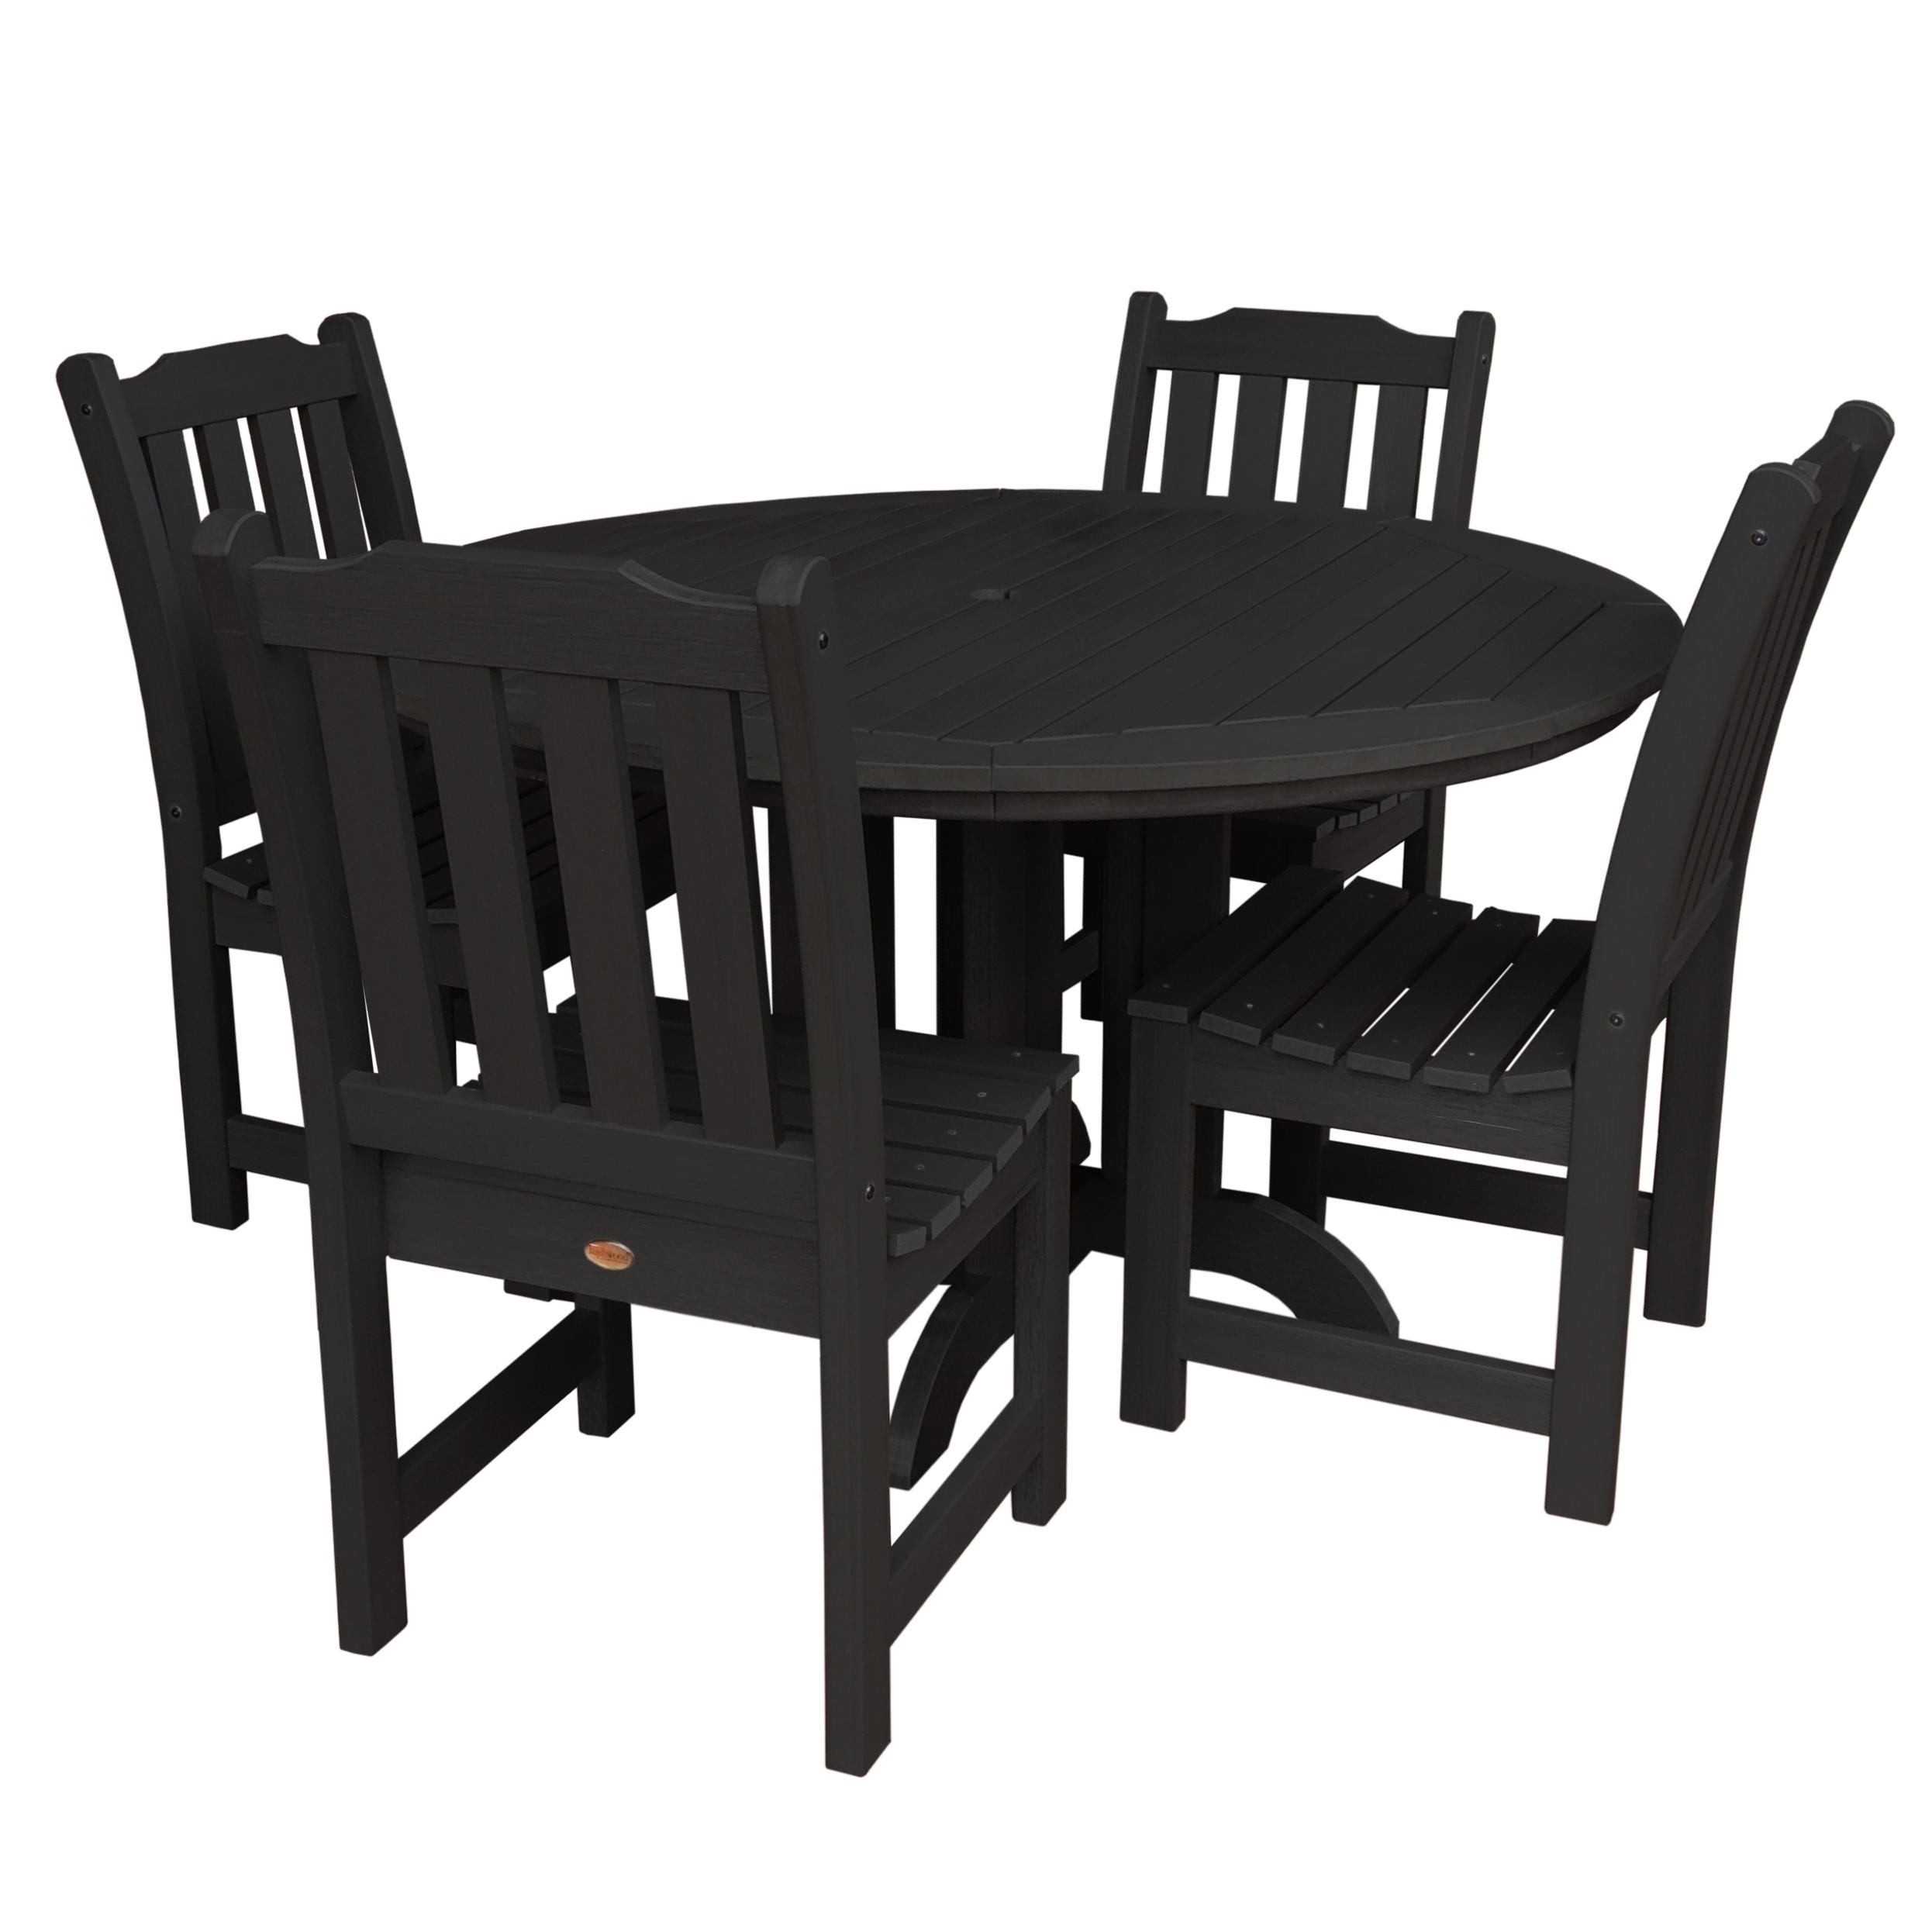 highwood® Eco-Friendly Recycled Plastic Lehigh 5pc Round Dining Set